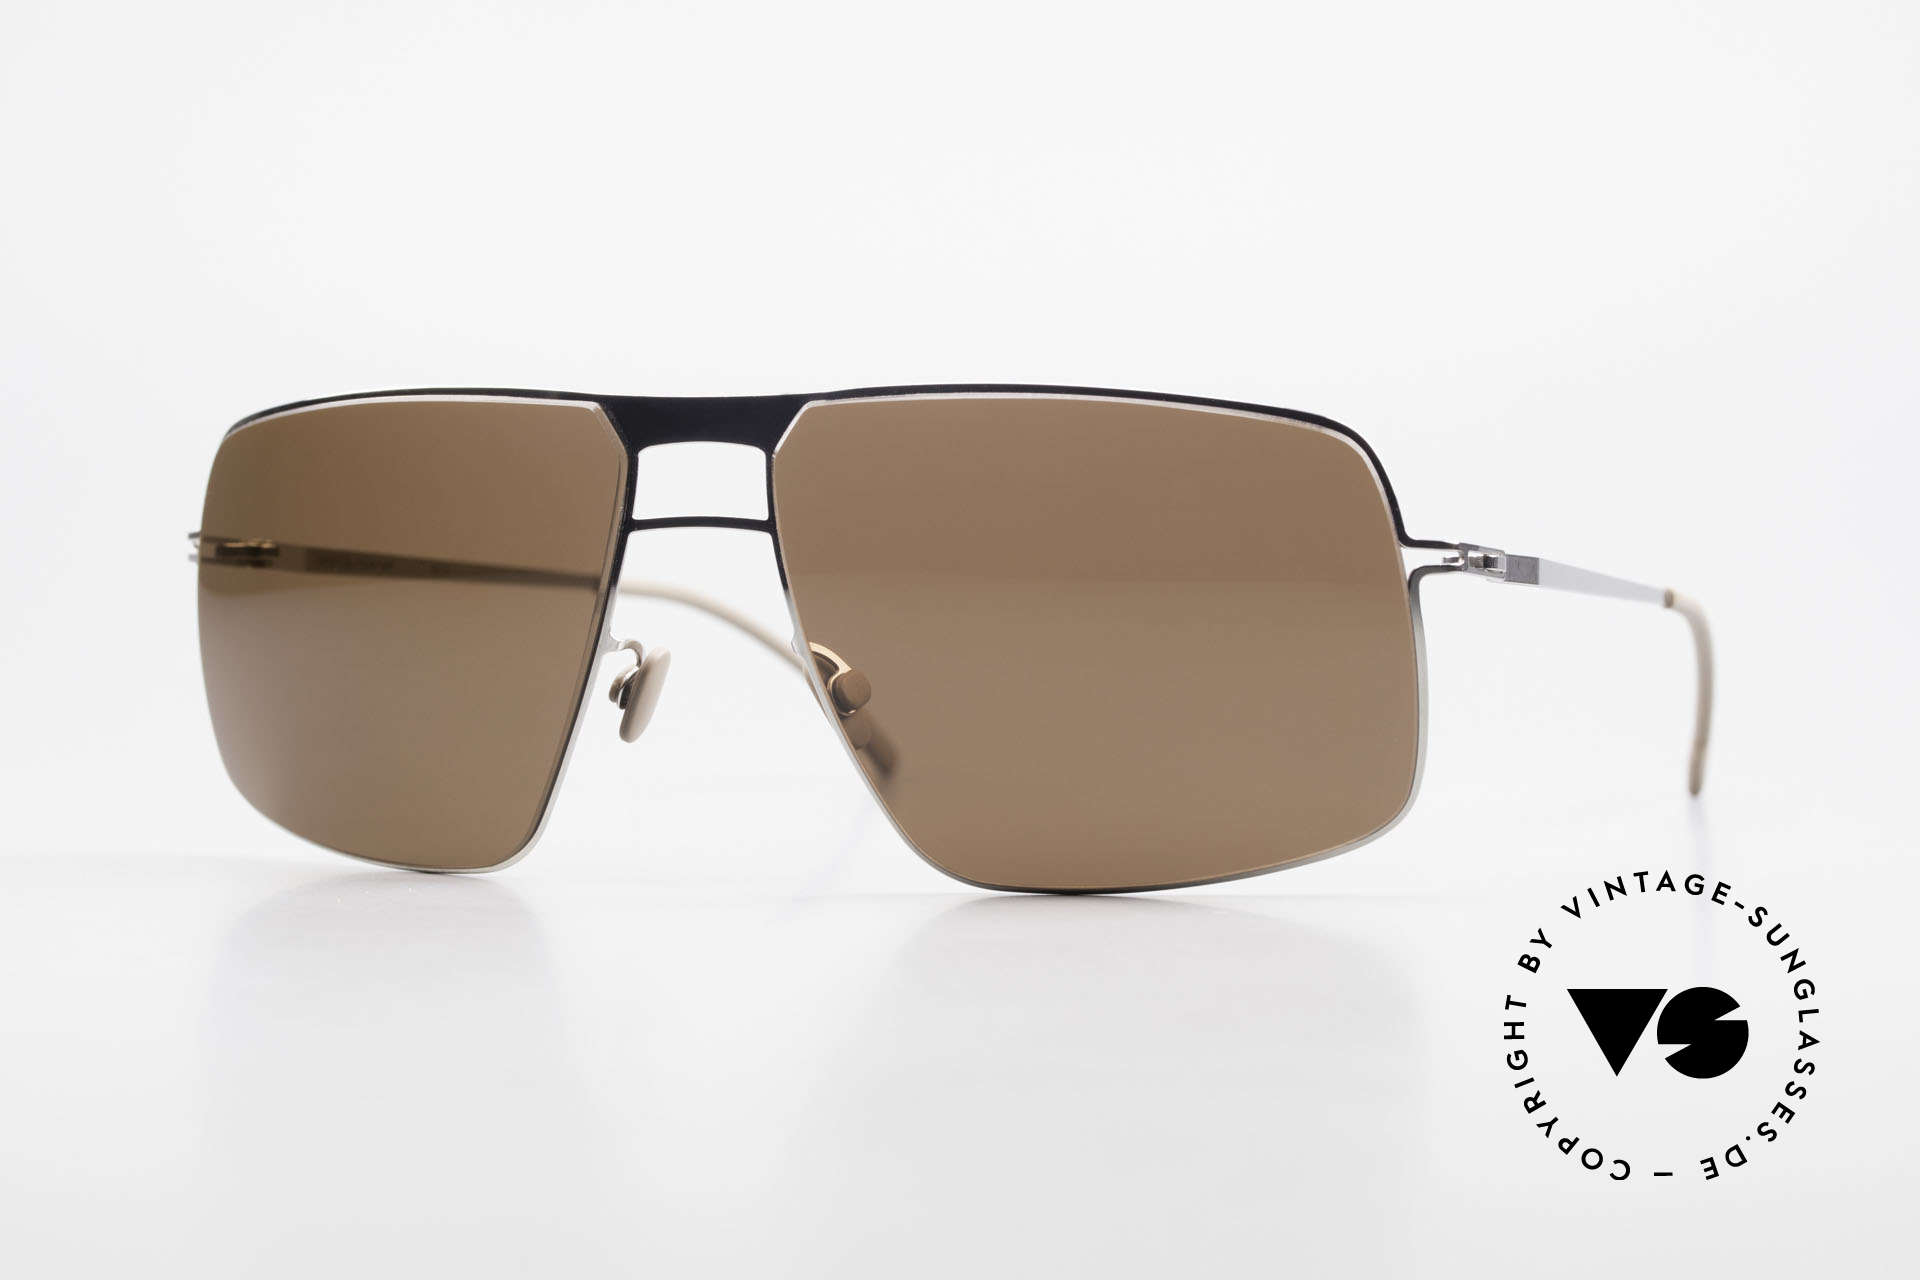 Mykita Leif Men's Designer Sunglasses 2011, original VINTAGE MYKITA men's sunglasses from 2011, Made for Men